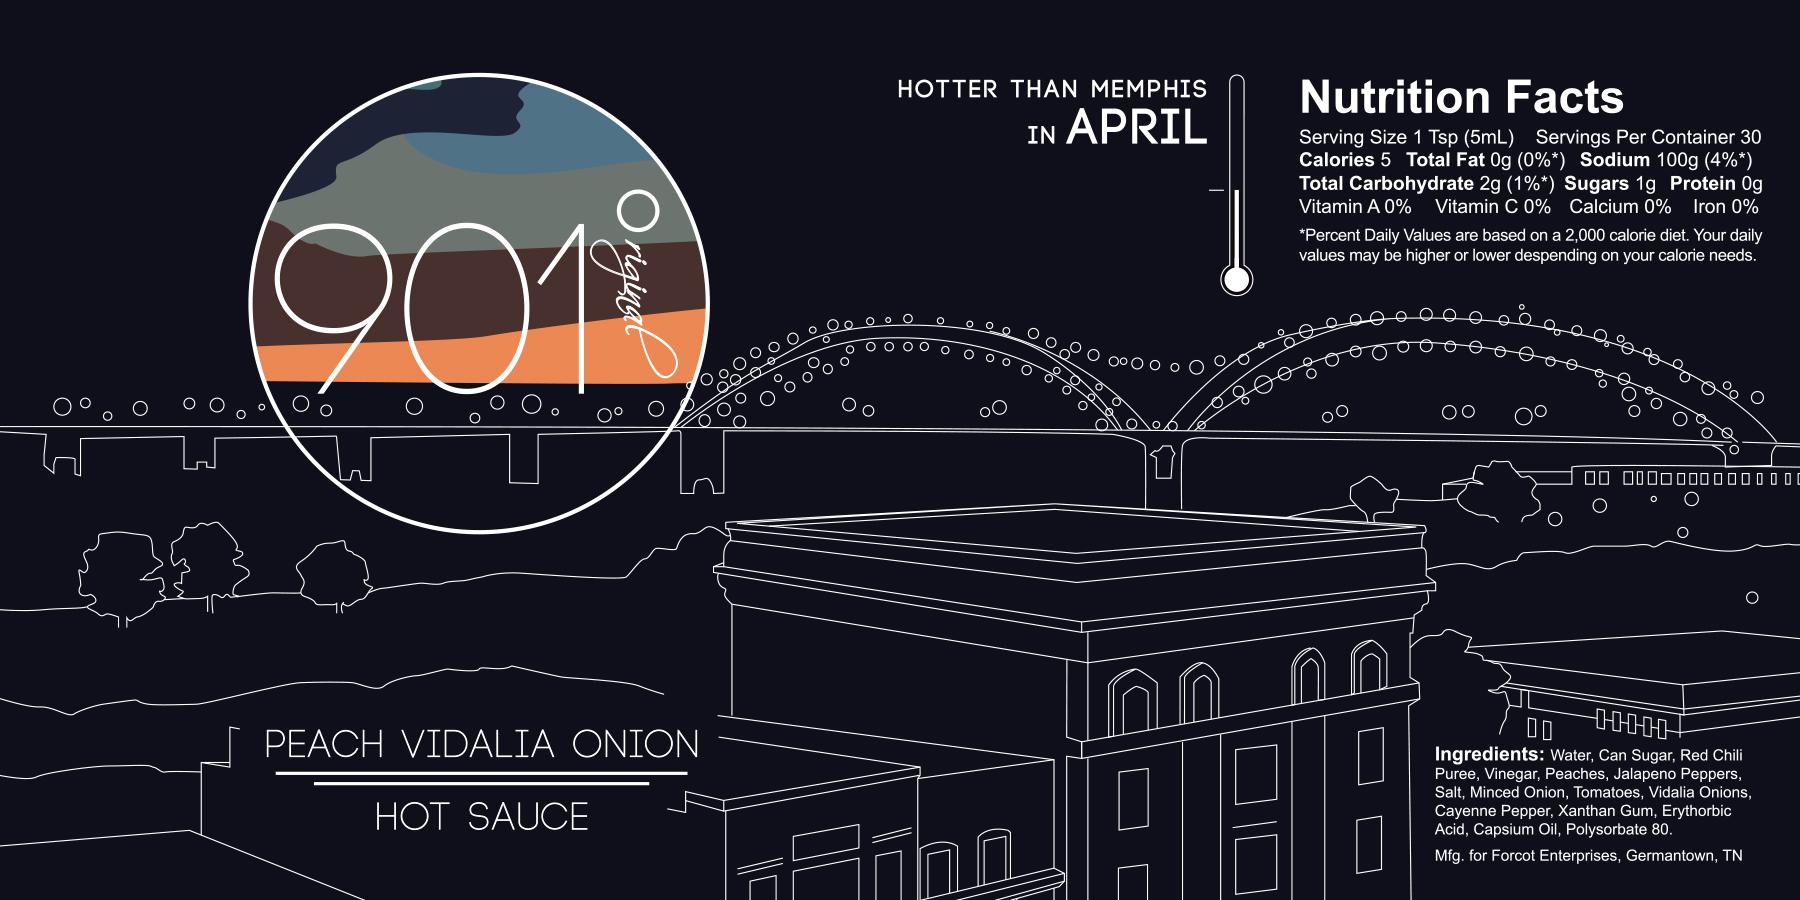 901-Hot-Sauce-1.jpg